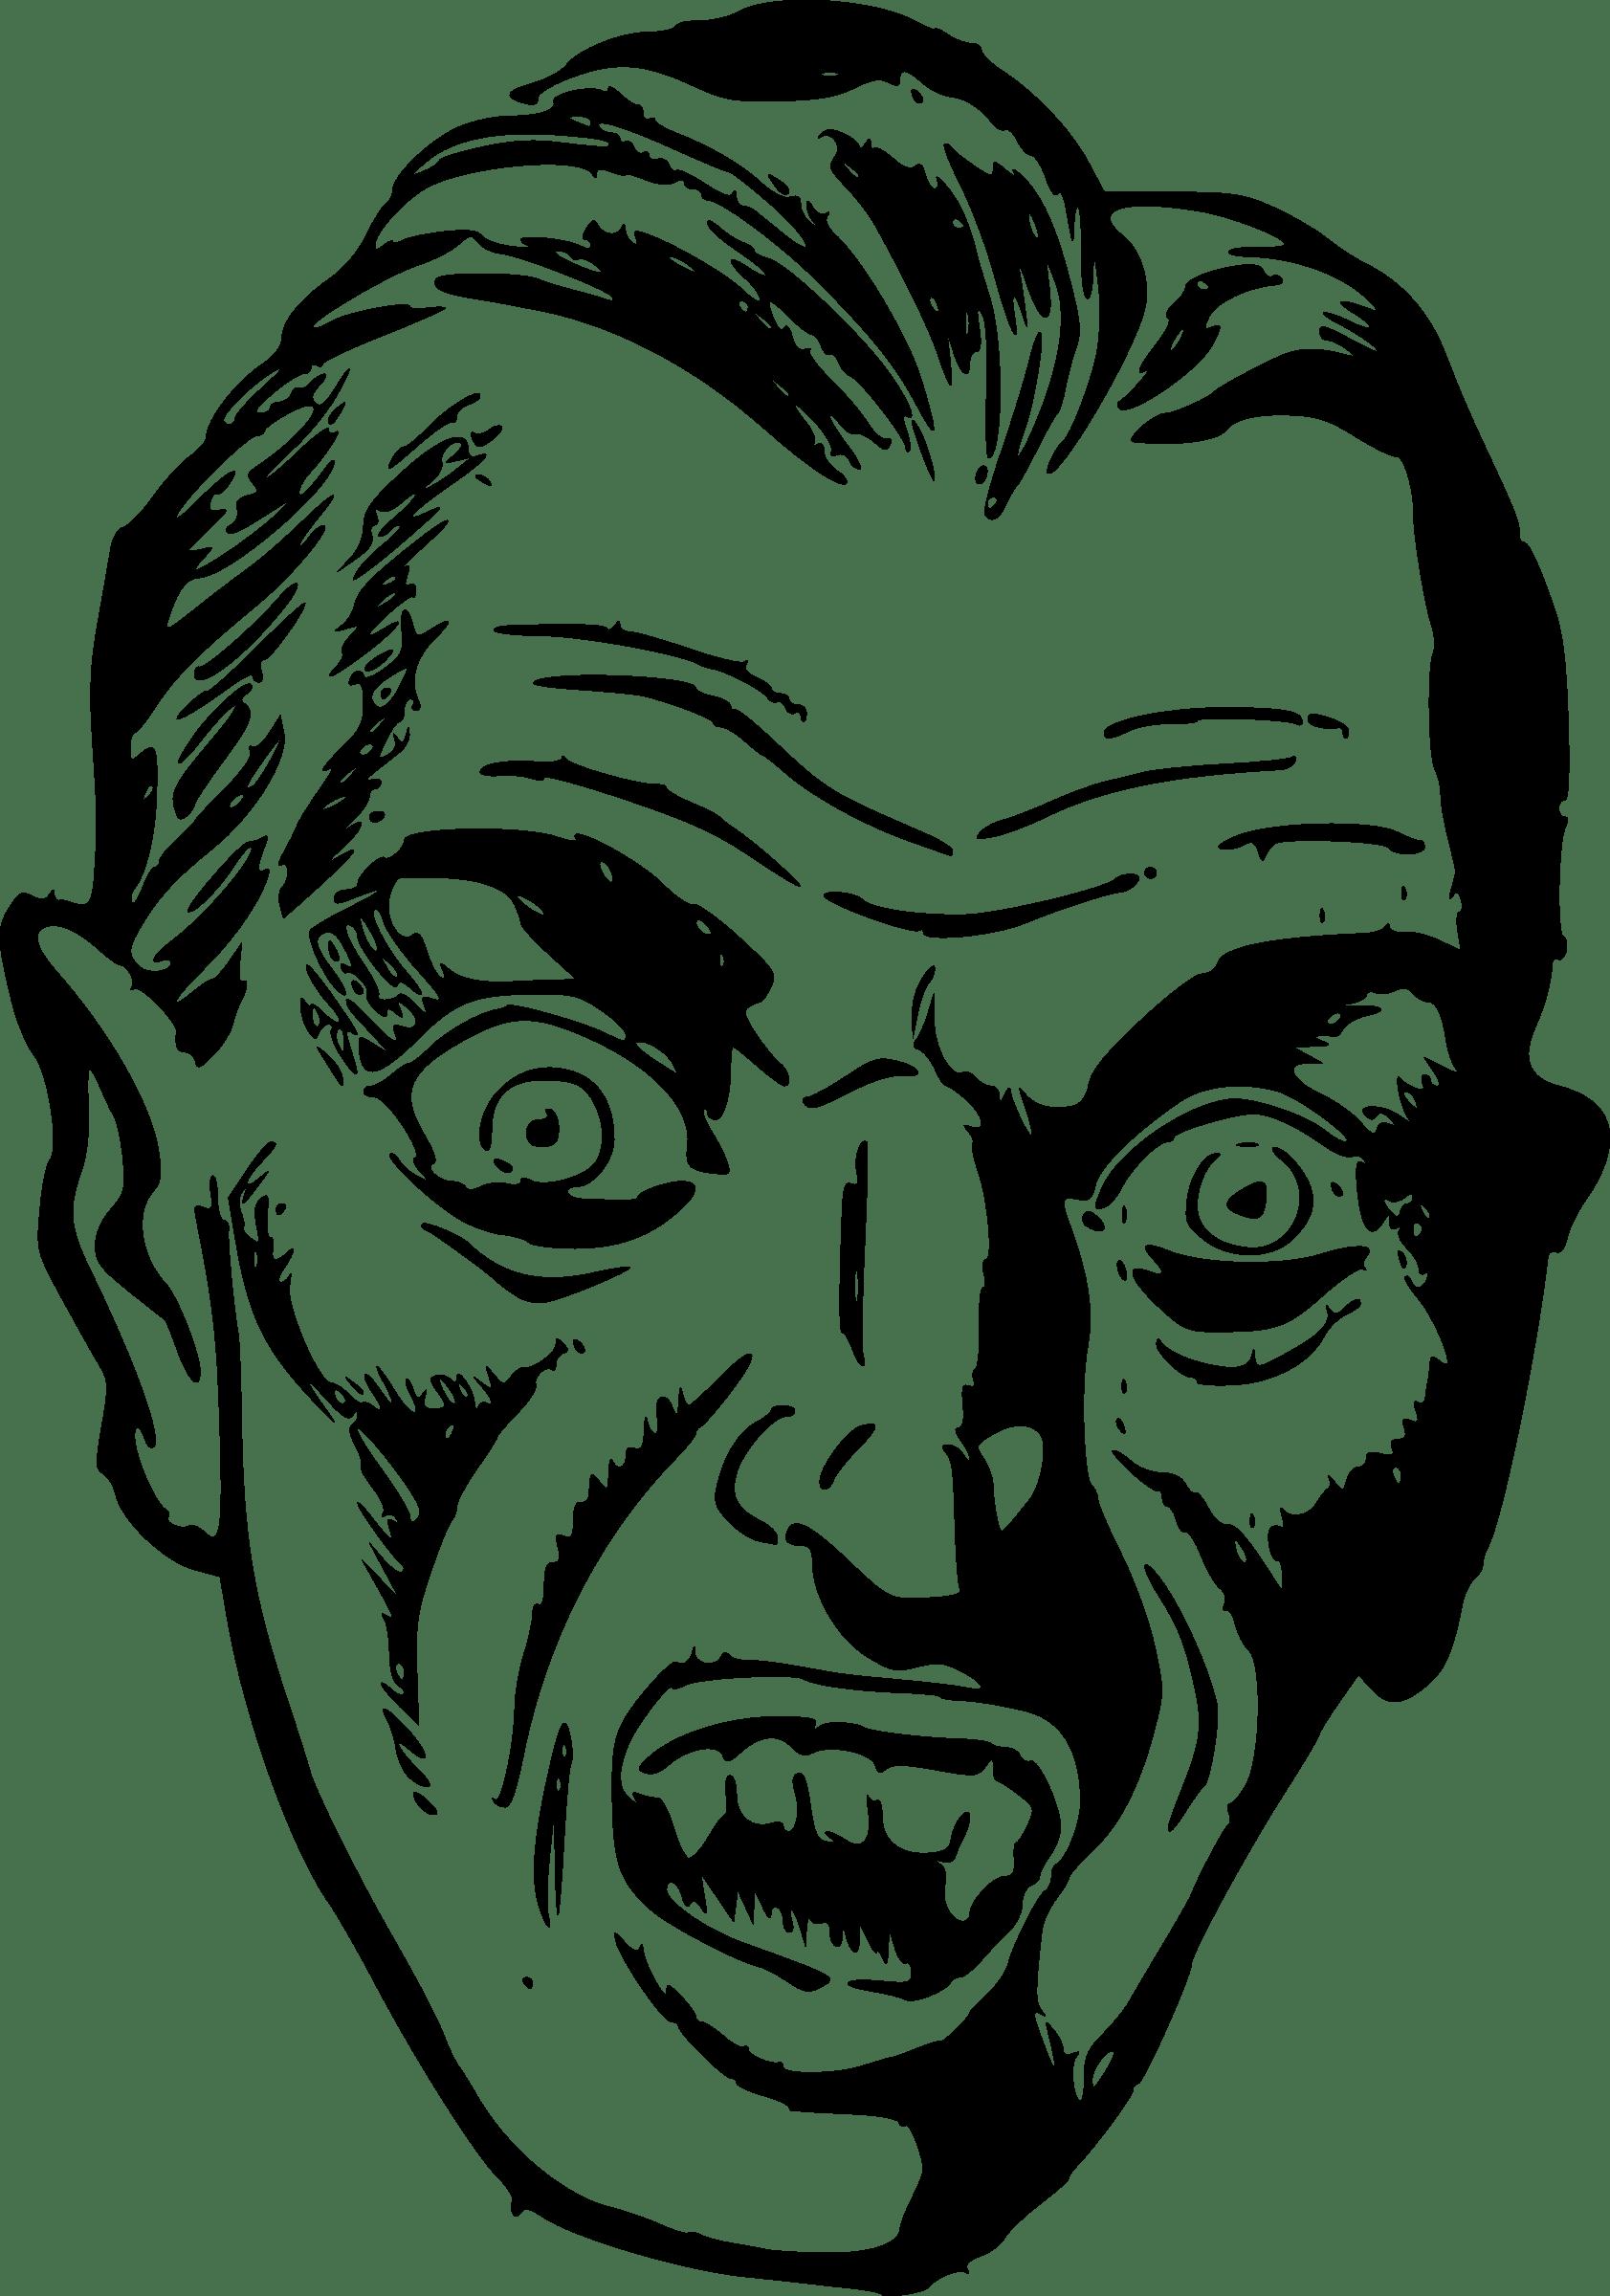 Vampiro clipart svg freeuse Vampire Clipart transparent PNG - StickPNG svg freeuse